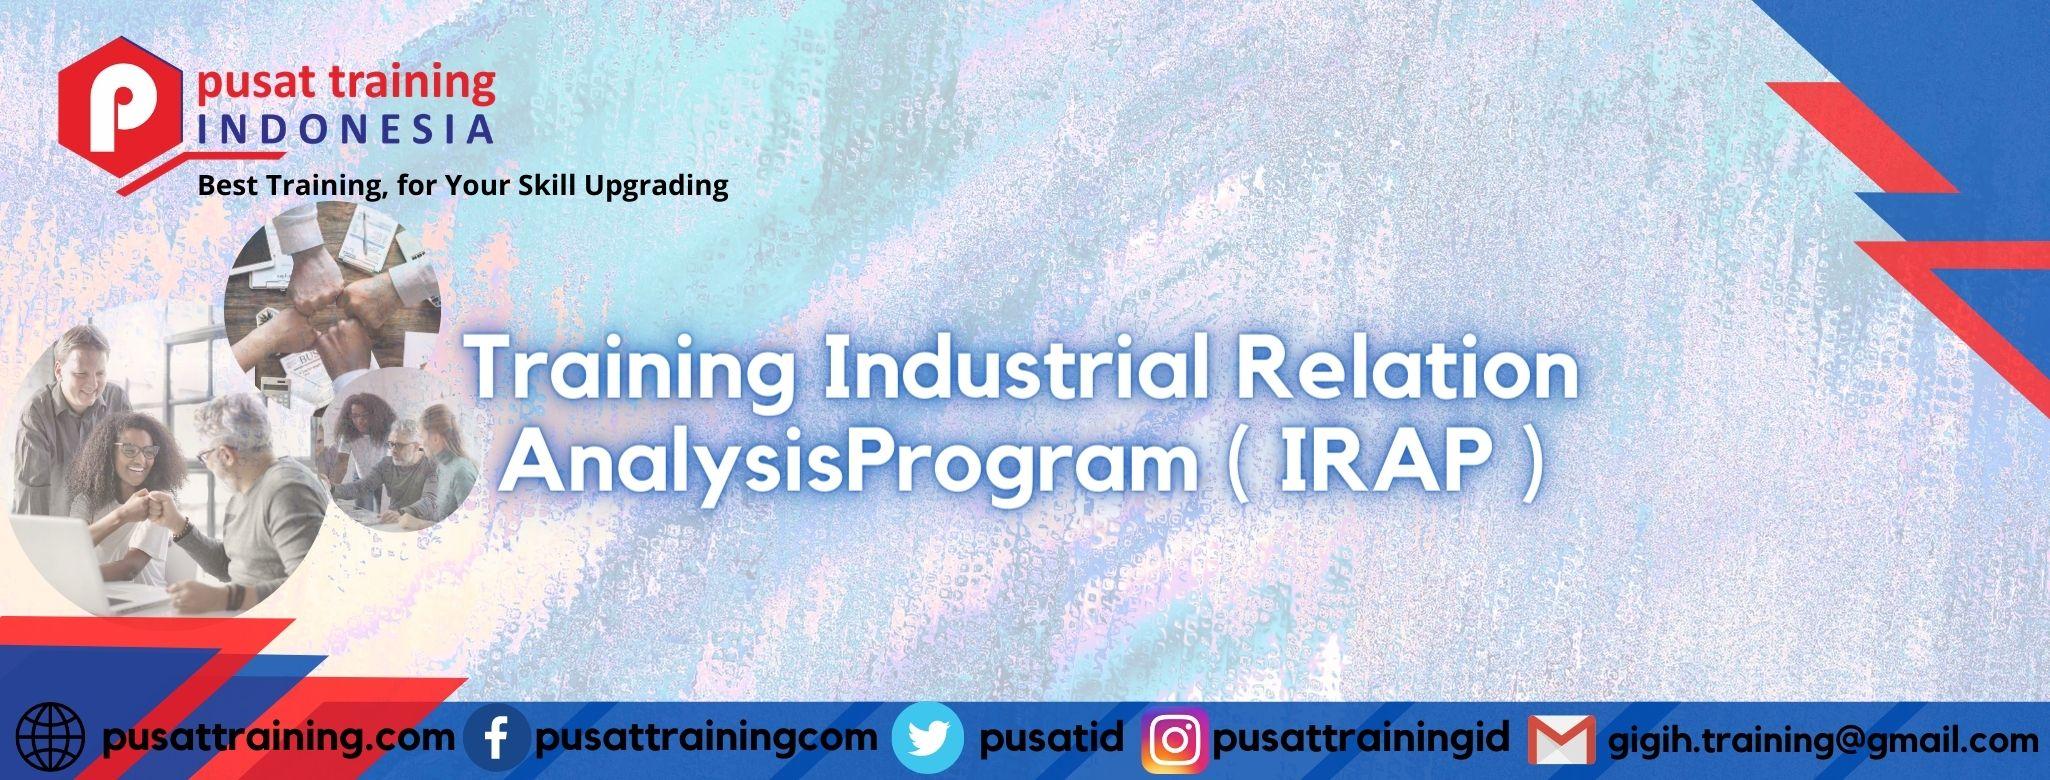 Training-Industrial-Relation-AnalysisProgram-IRAP